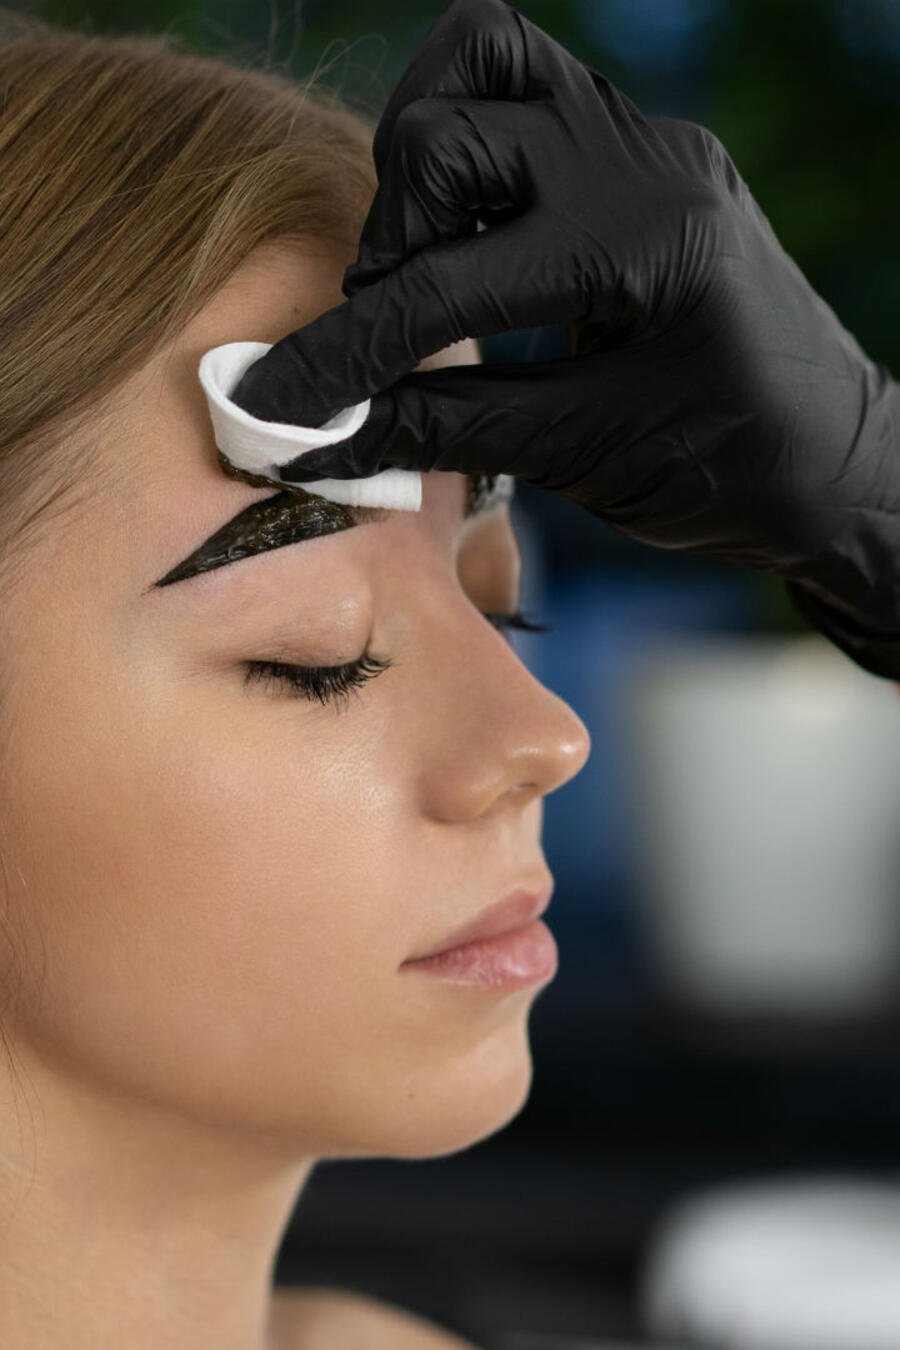 Mujer aplicando tinte de cejas